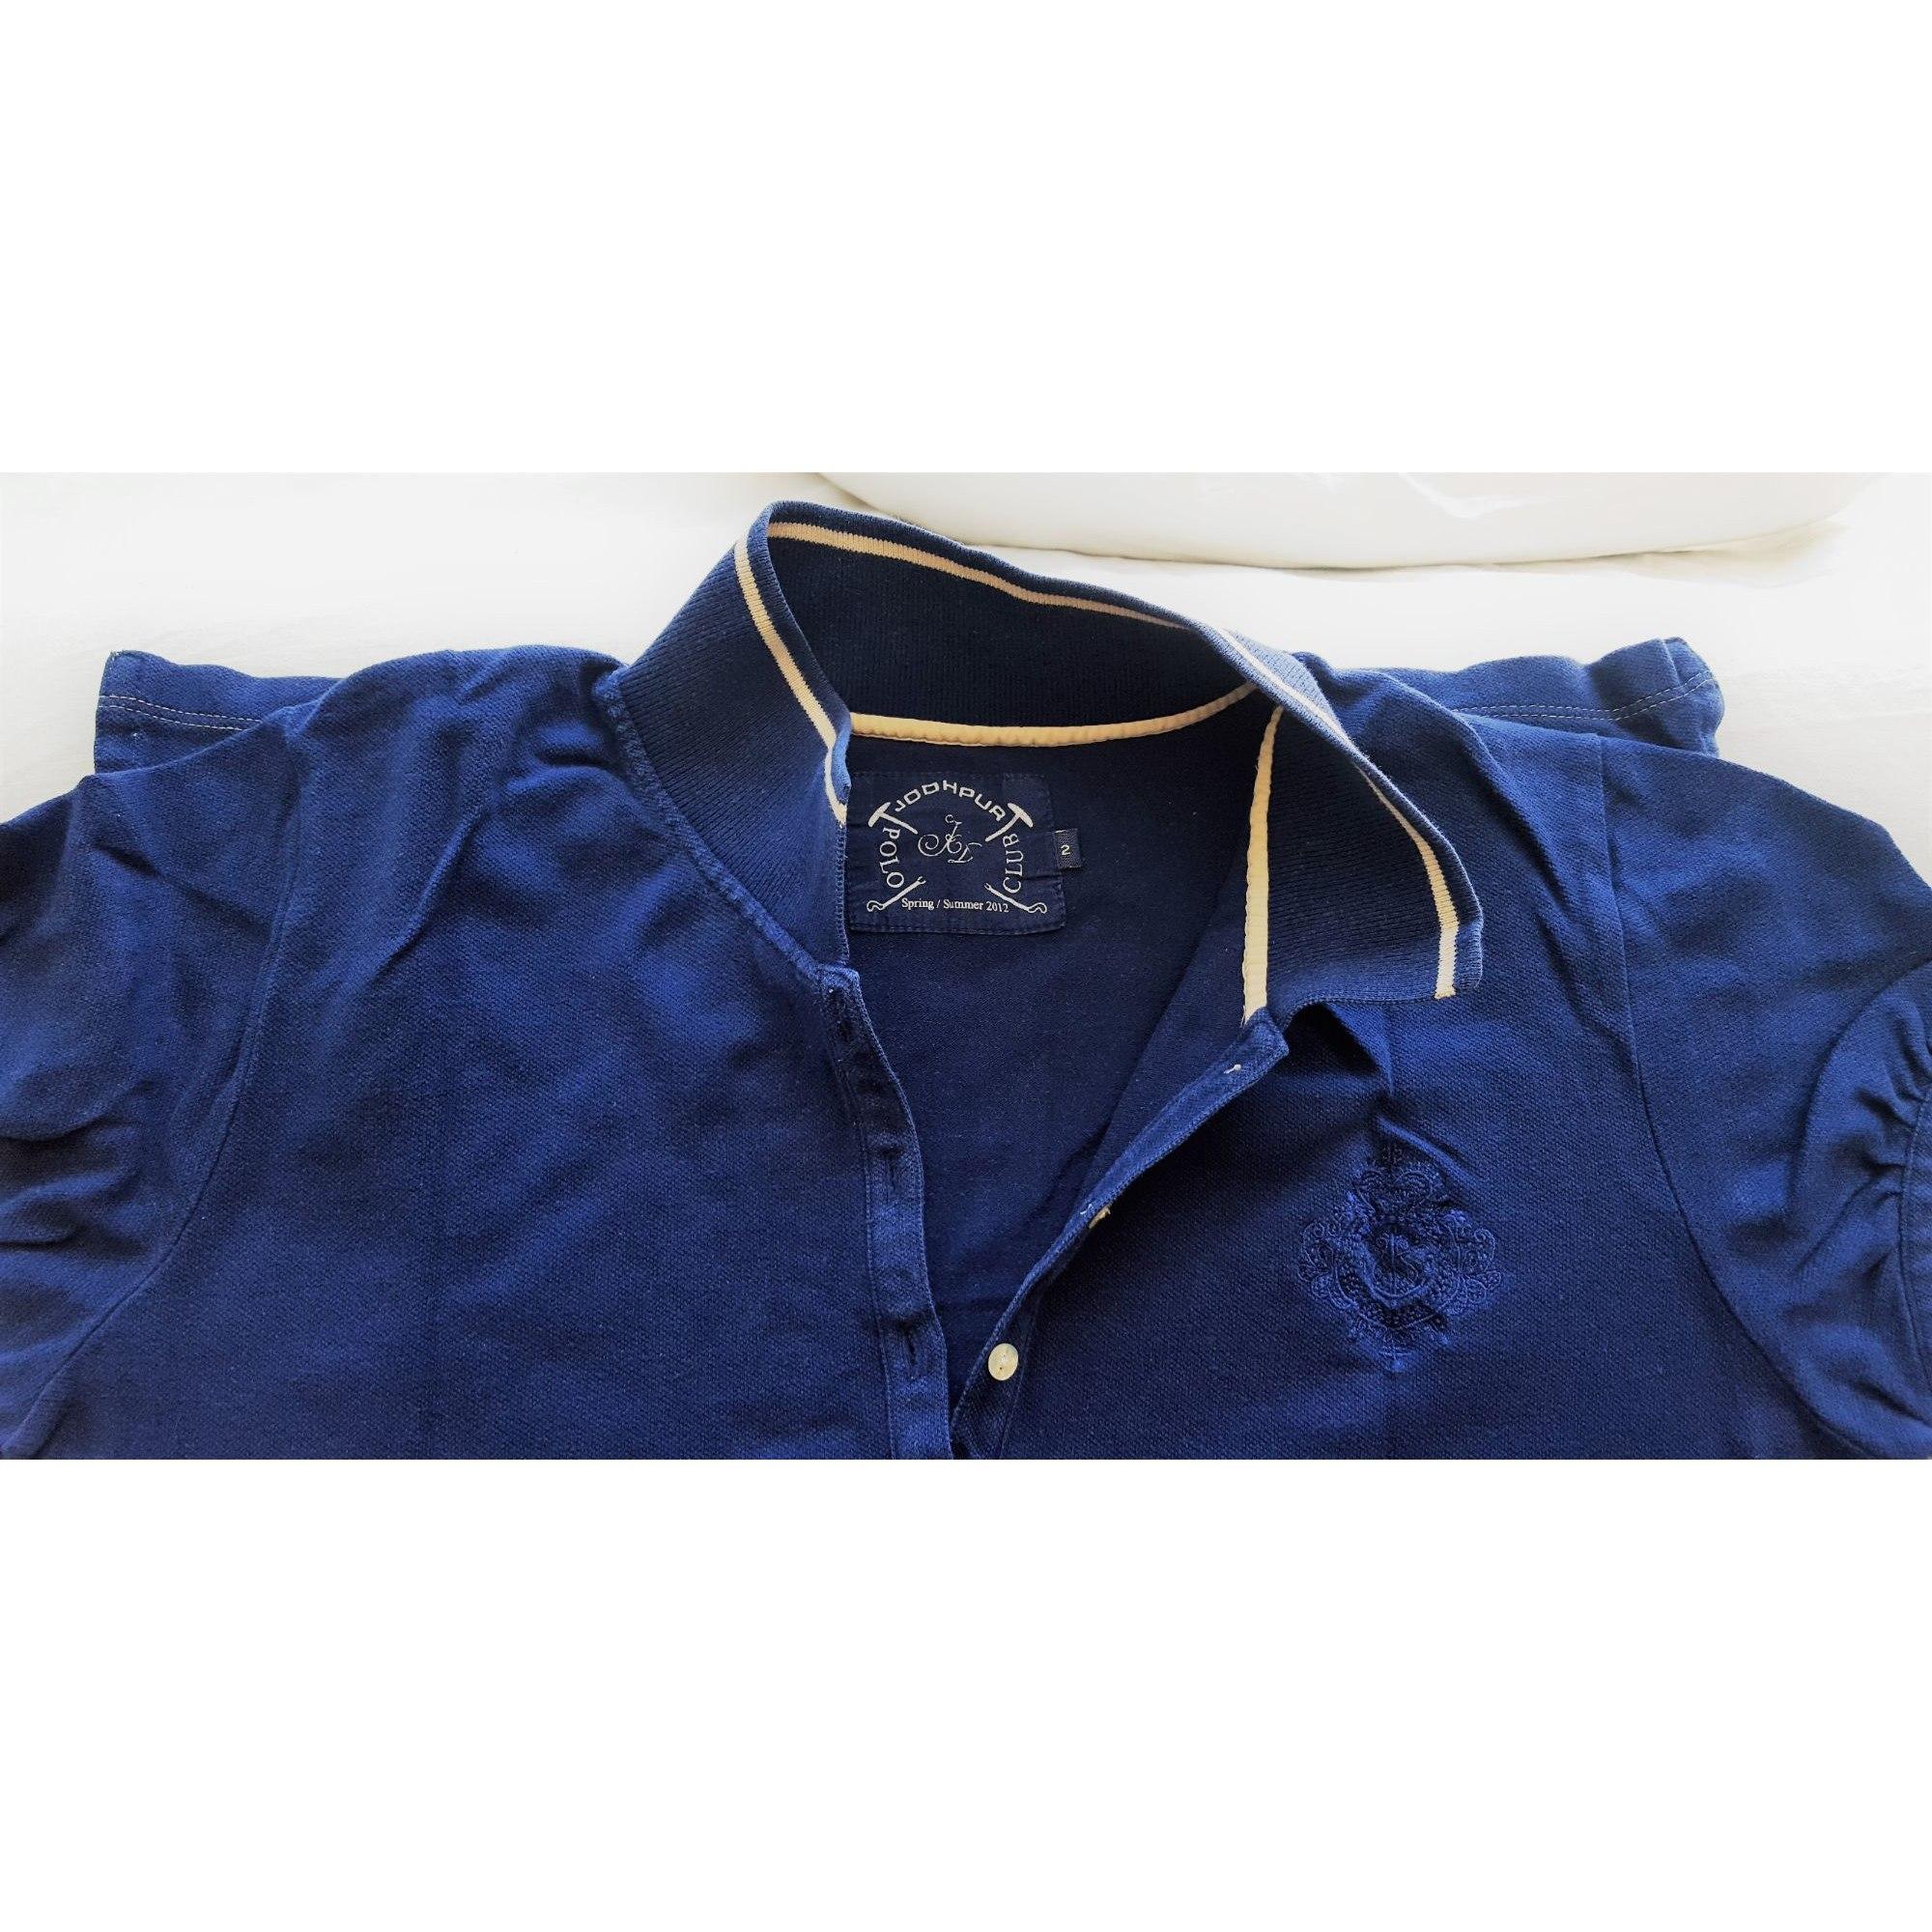 Polo JOOPHUR POLO CLUB Bleu, bleu marine, bleu turquoise